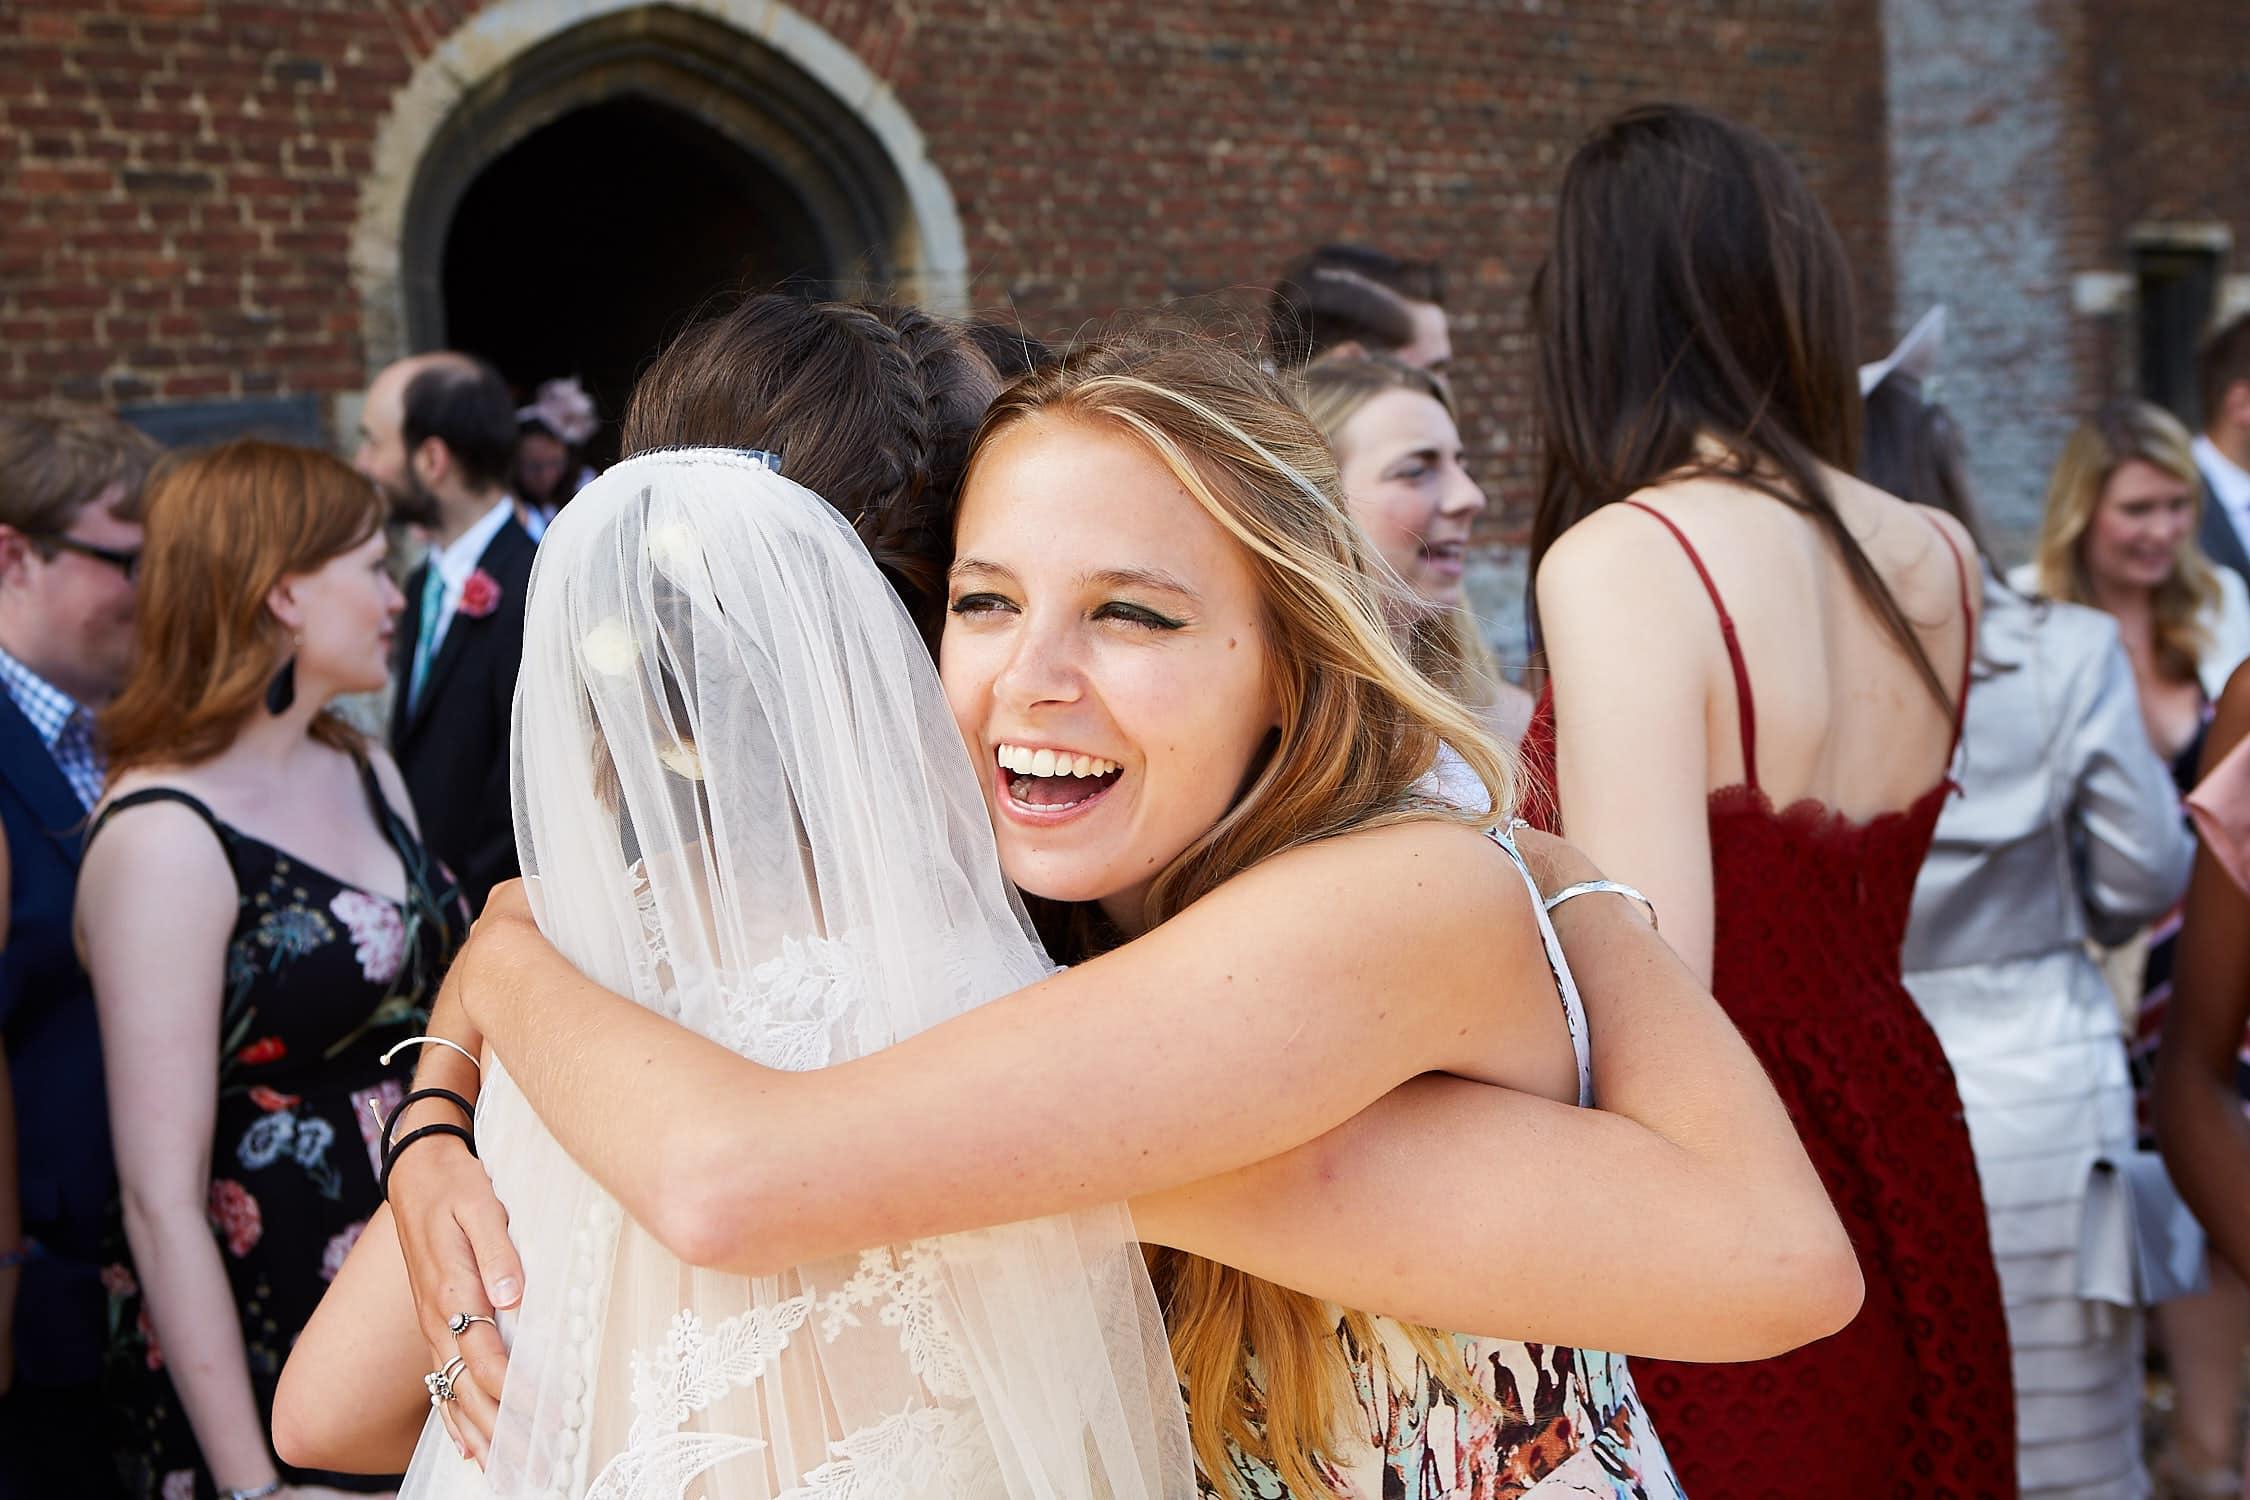 Hugging a bride a guest smiles